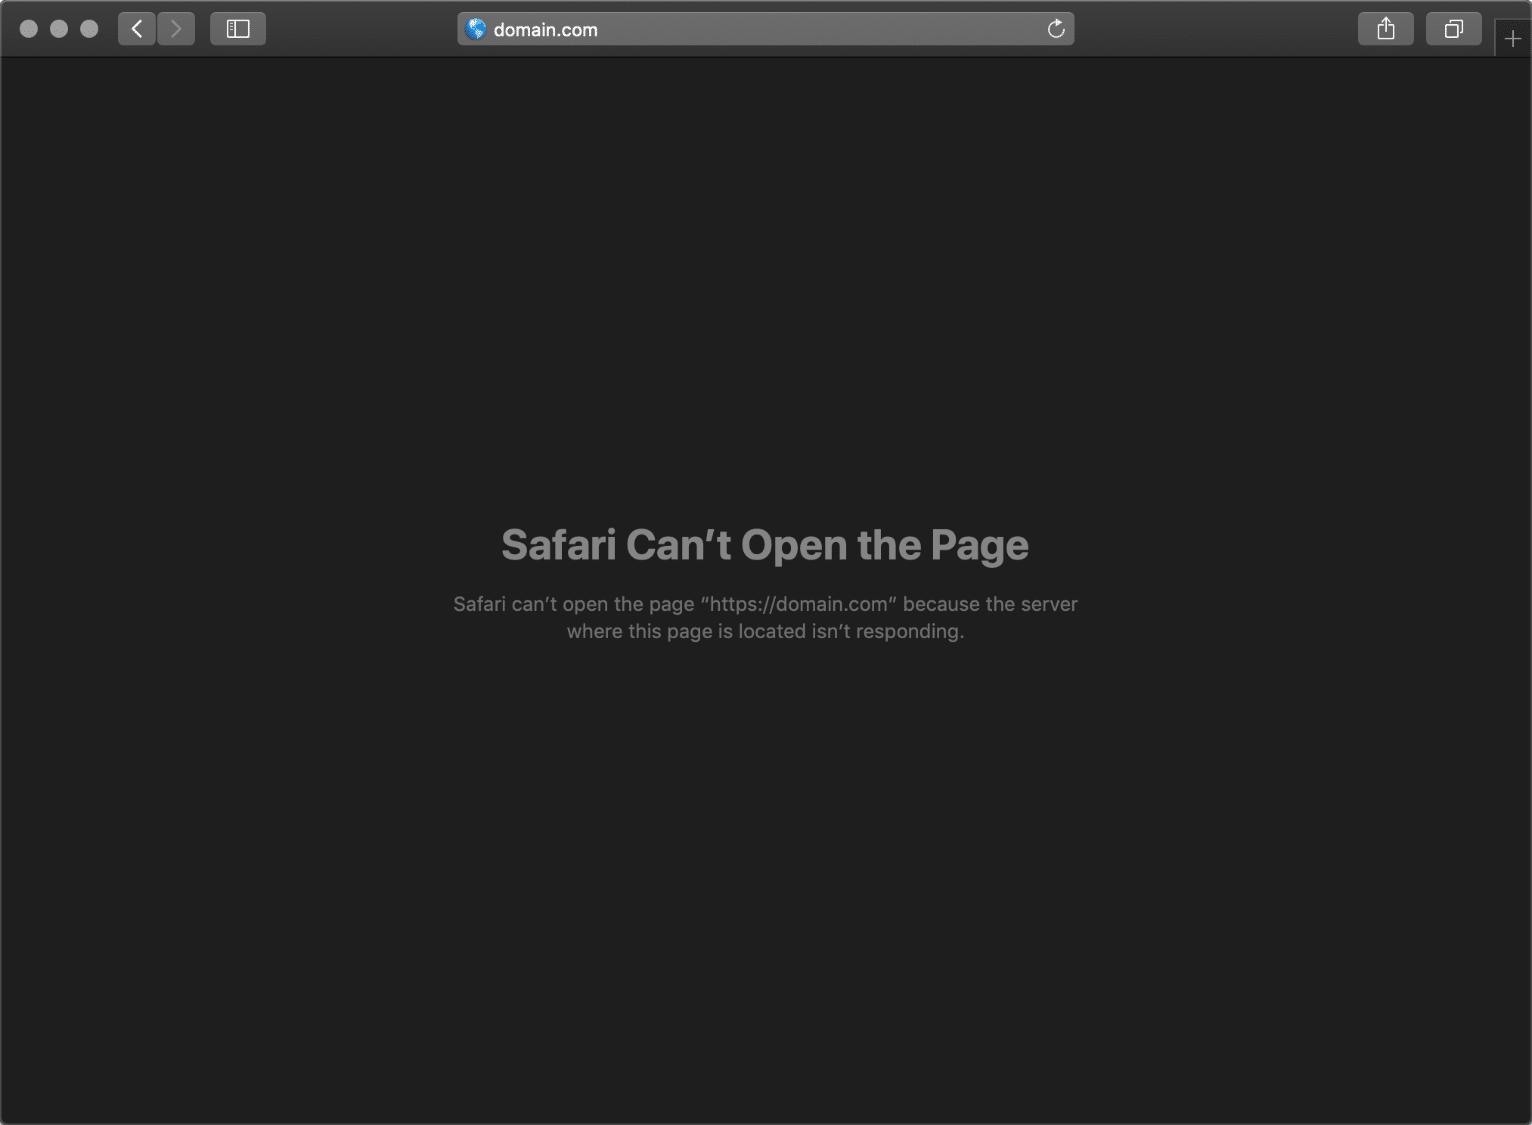 ERR_CONNECTION_TIMED_OUT fejl i Safari